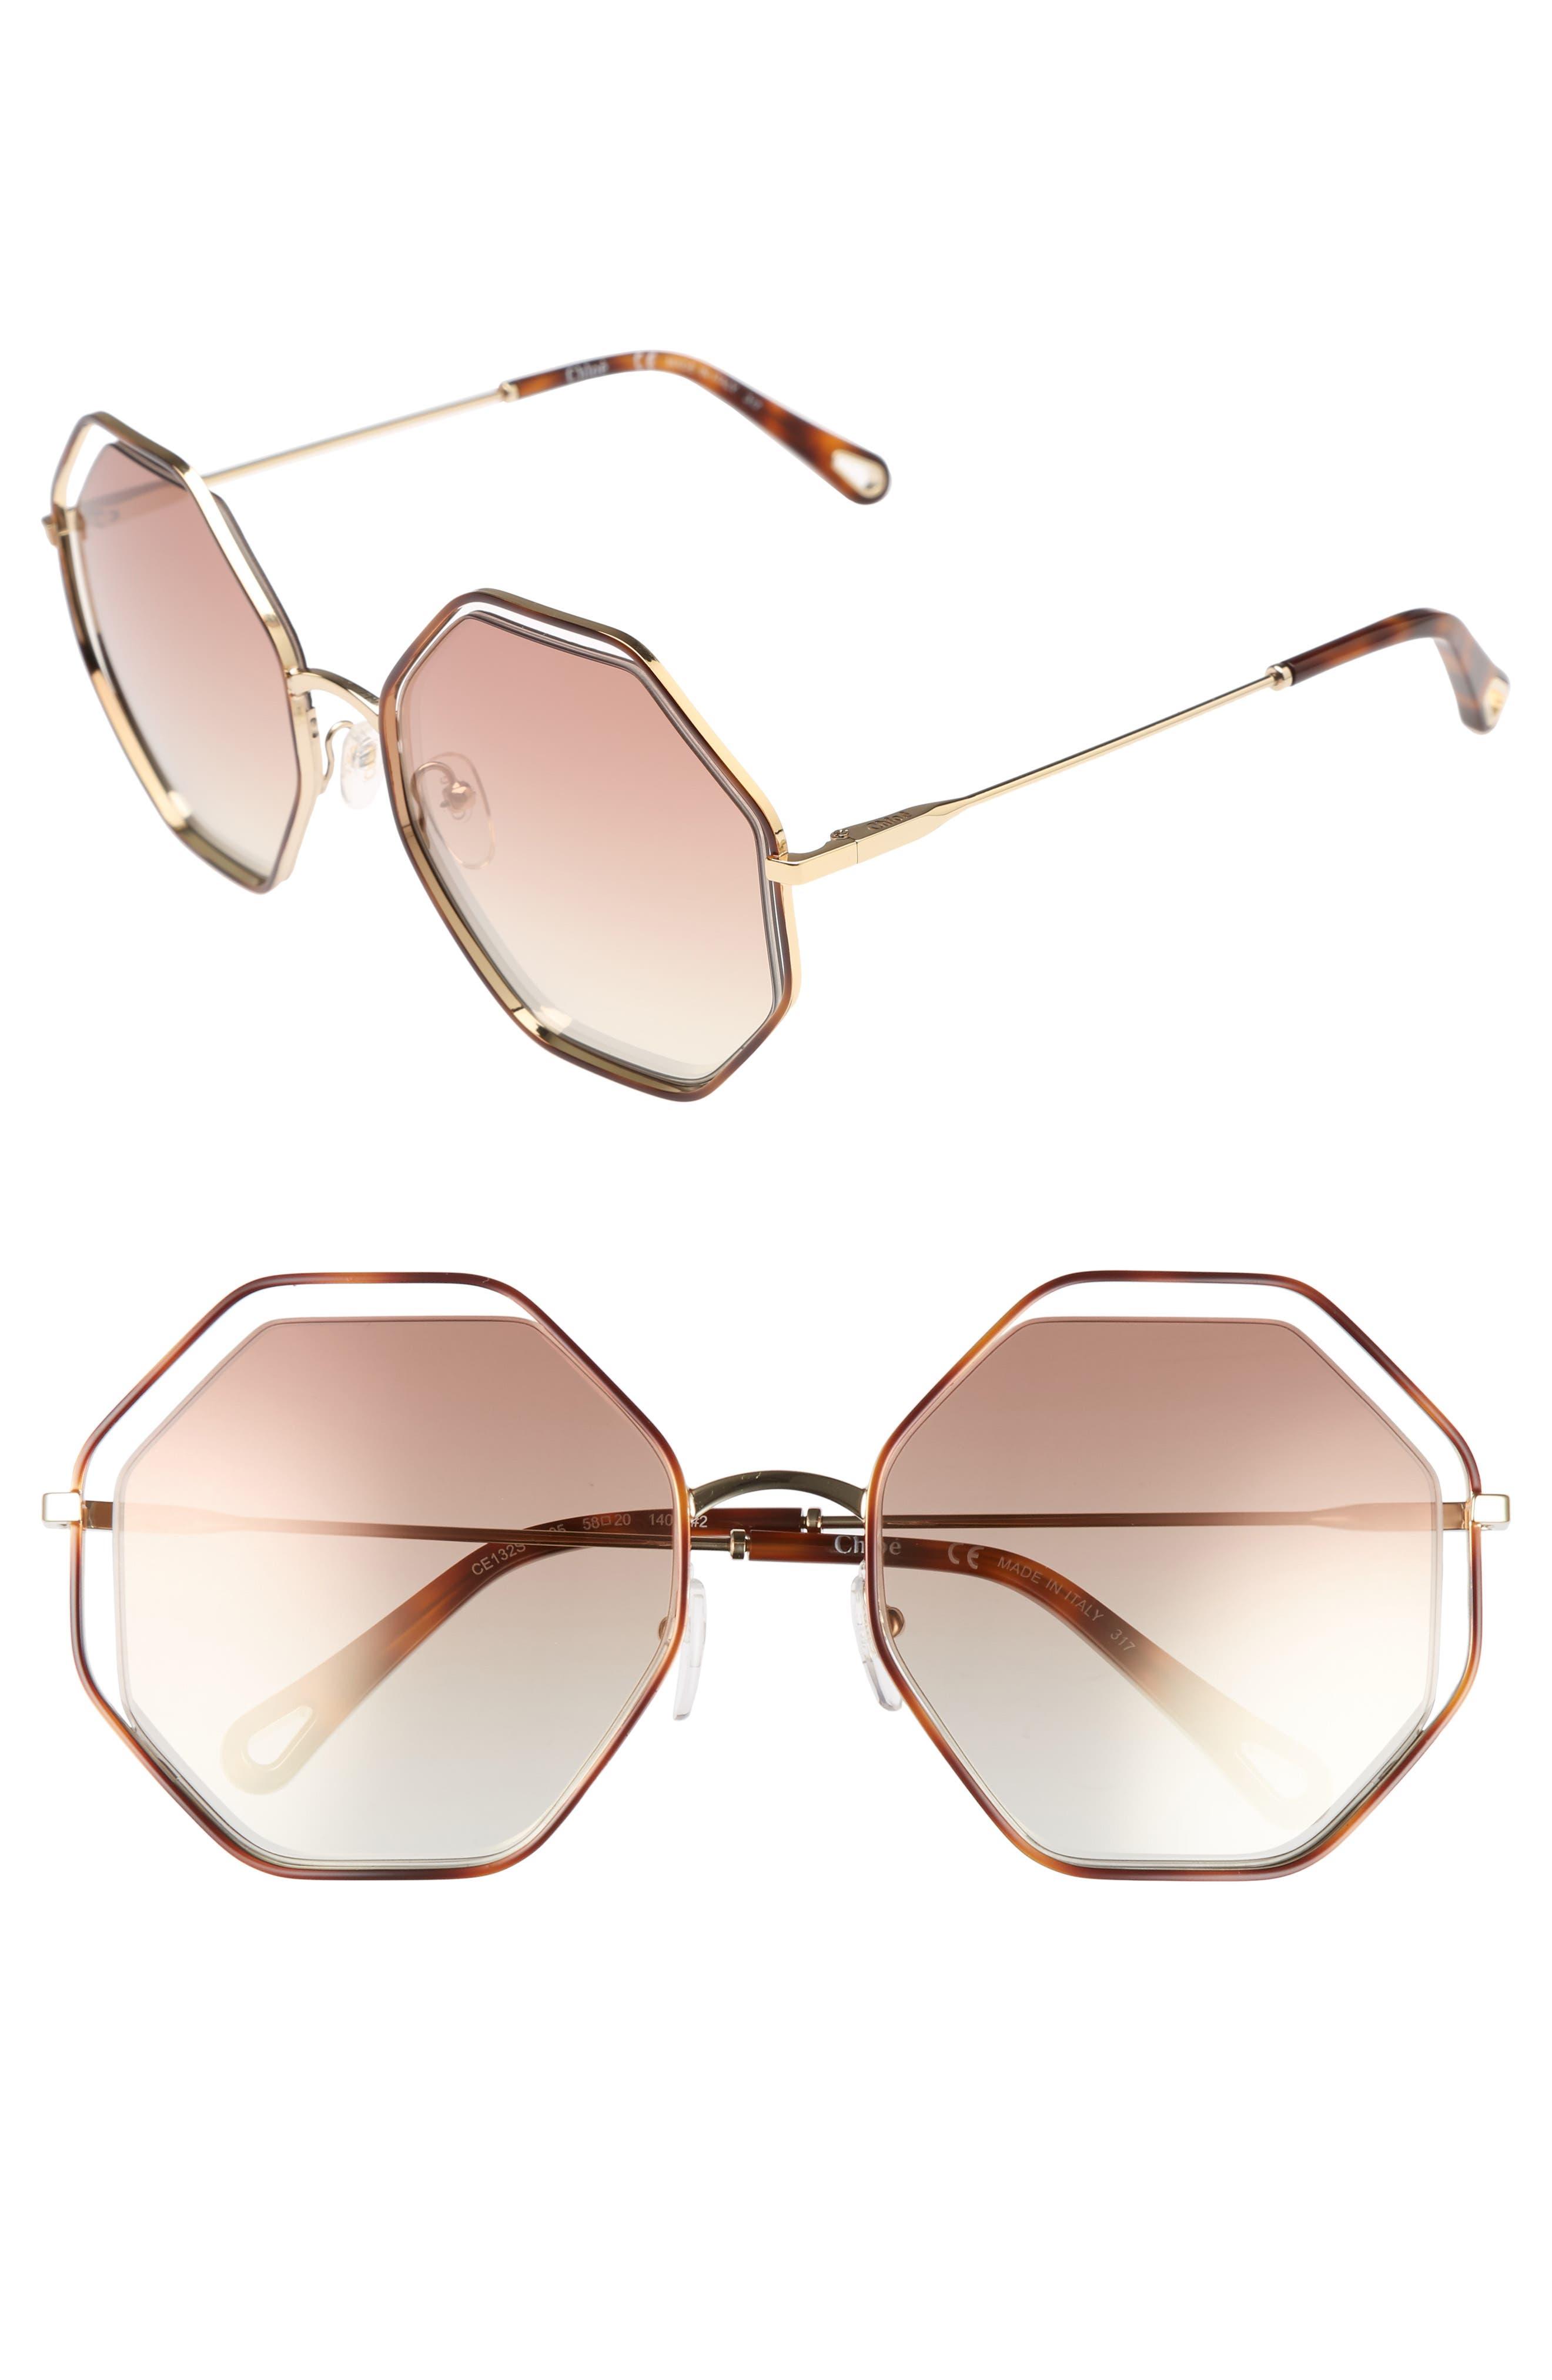 58mm Octagonal Halo Lens Sunglasses,                         Main,                         color, HAVANA/ BRONZE